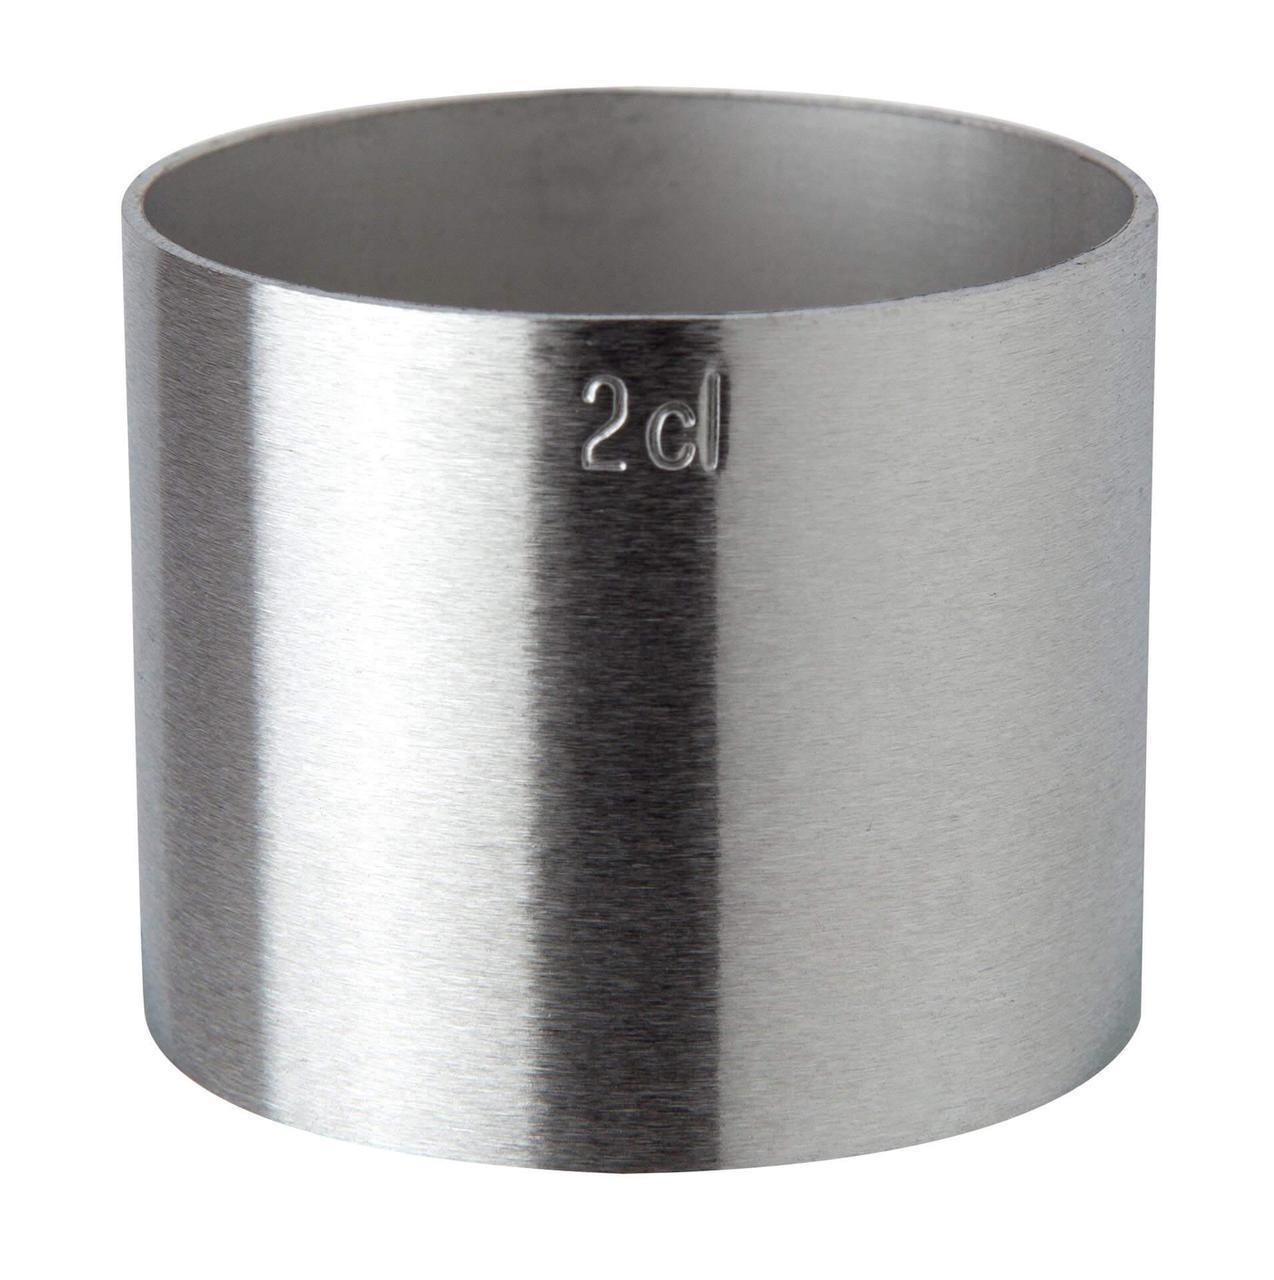 Джигер Beaumont 20 мл нержавеющая сталь (3195)